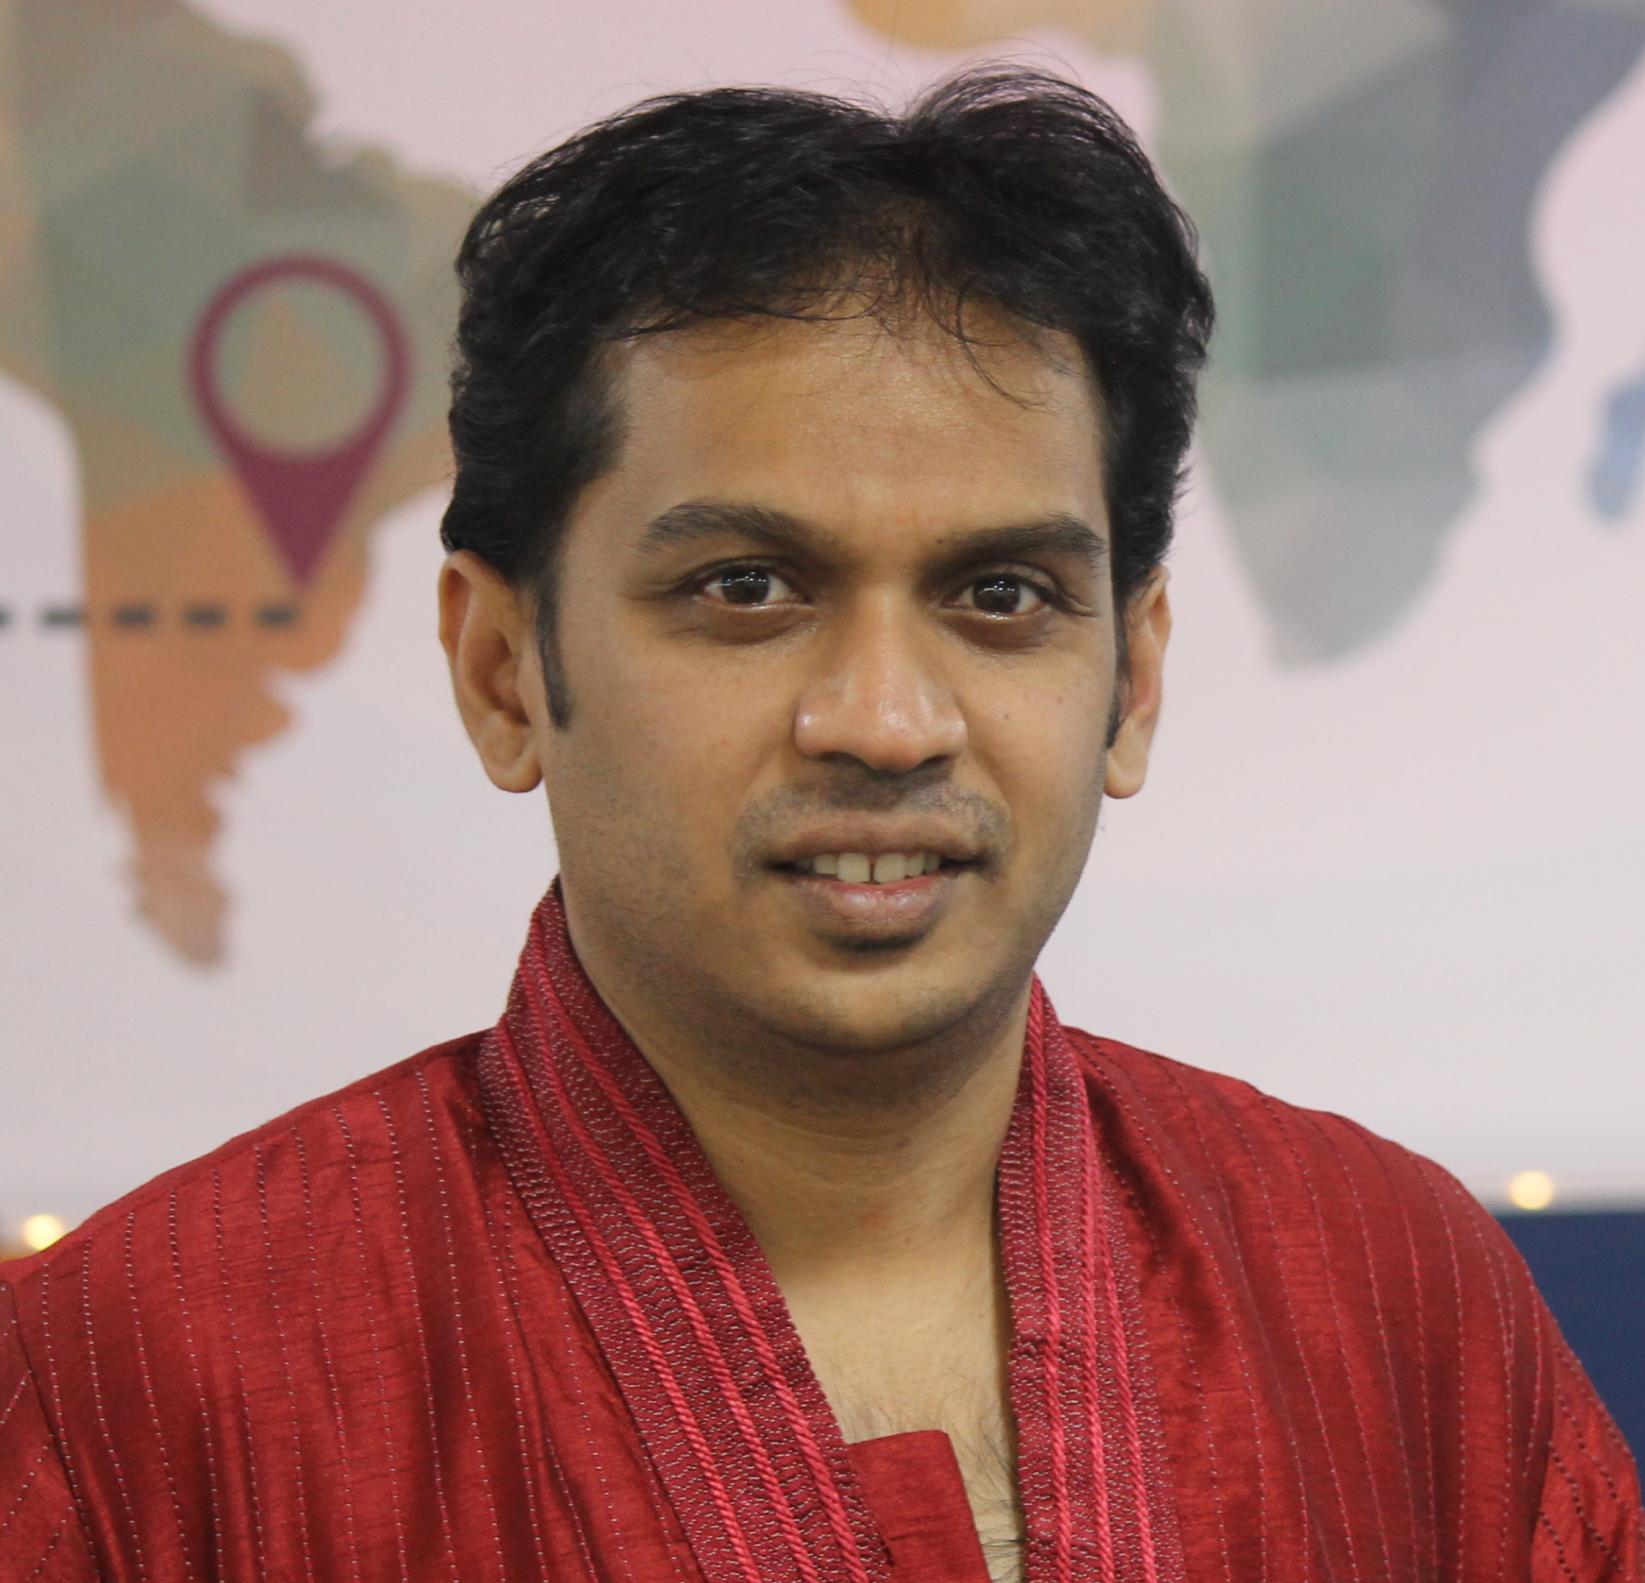 Headshot of Mohan Datar